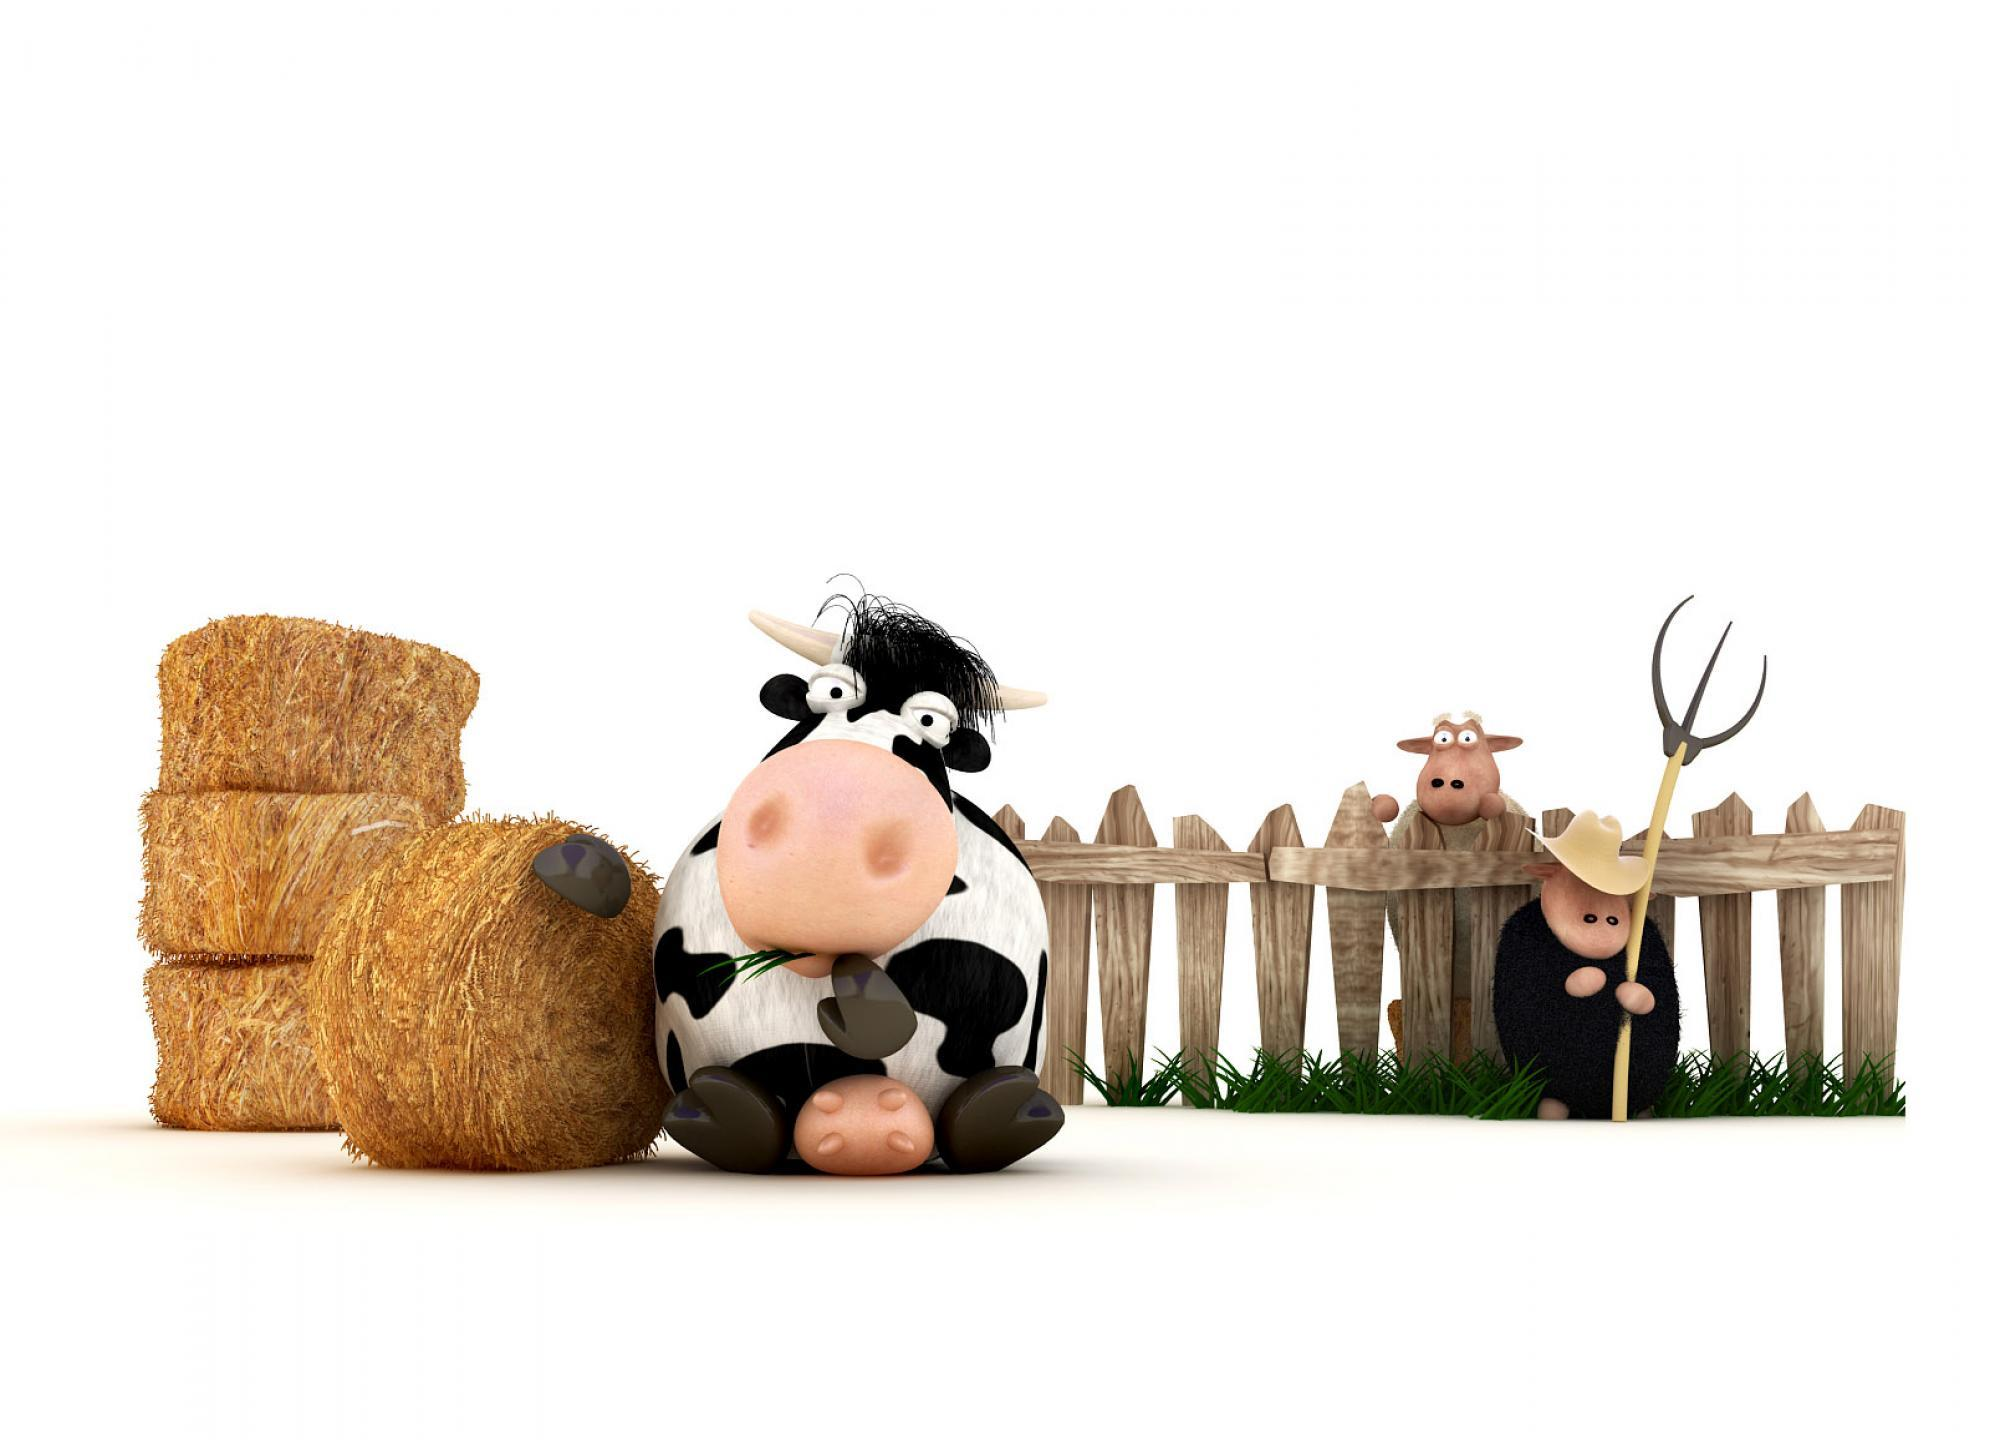 Headcorn minimalist house - Cute Cow Wallpapers Wallpaper Cave Cute Cow Wallpapers Wallpaper Cave